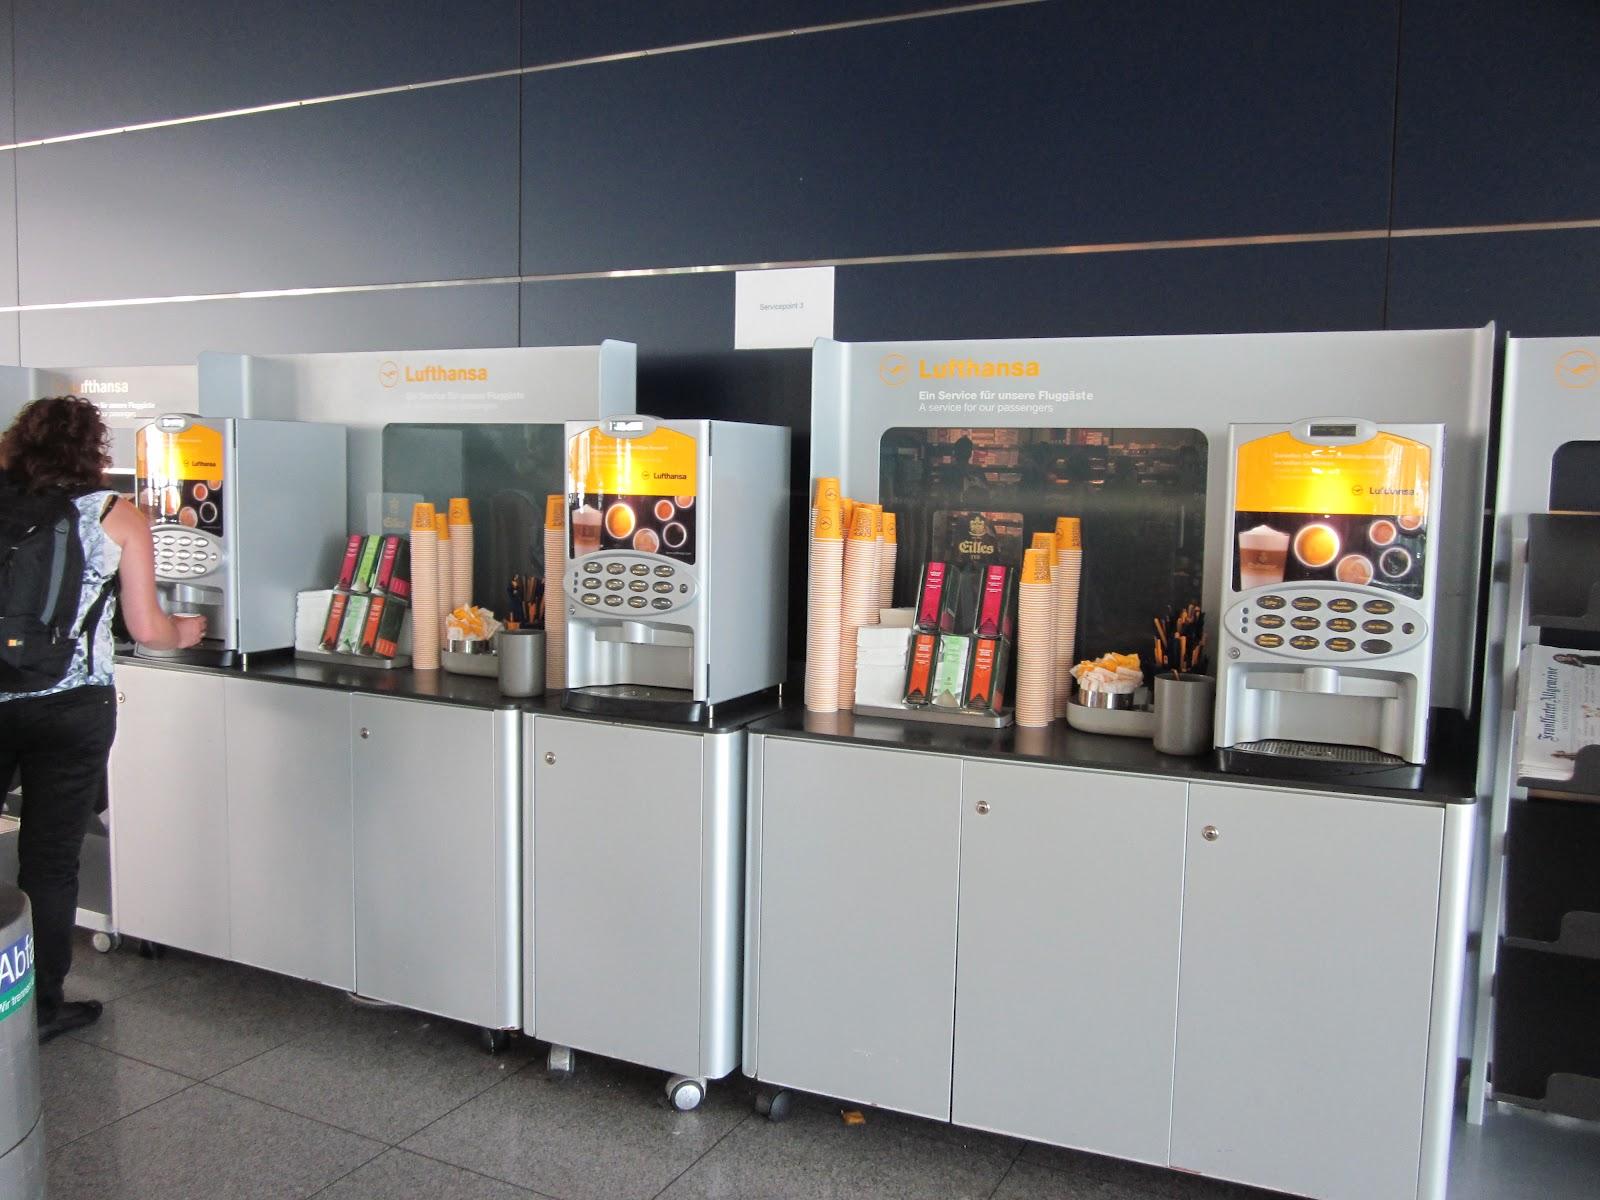 scandinavian airlines check in düsseldorf